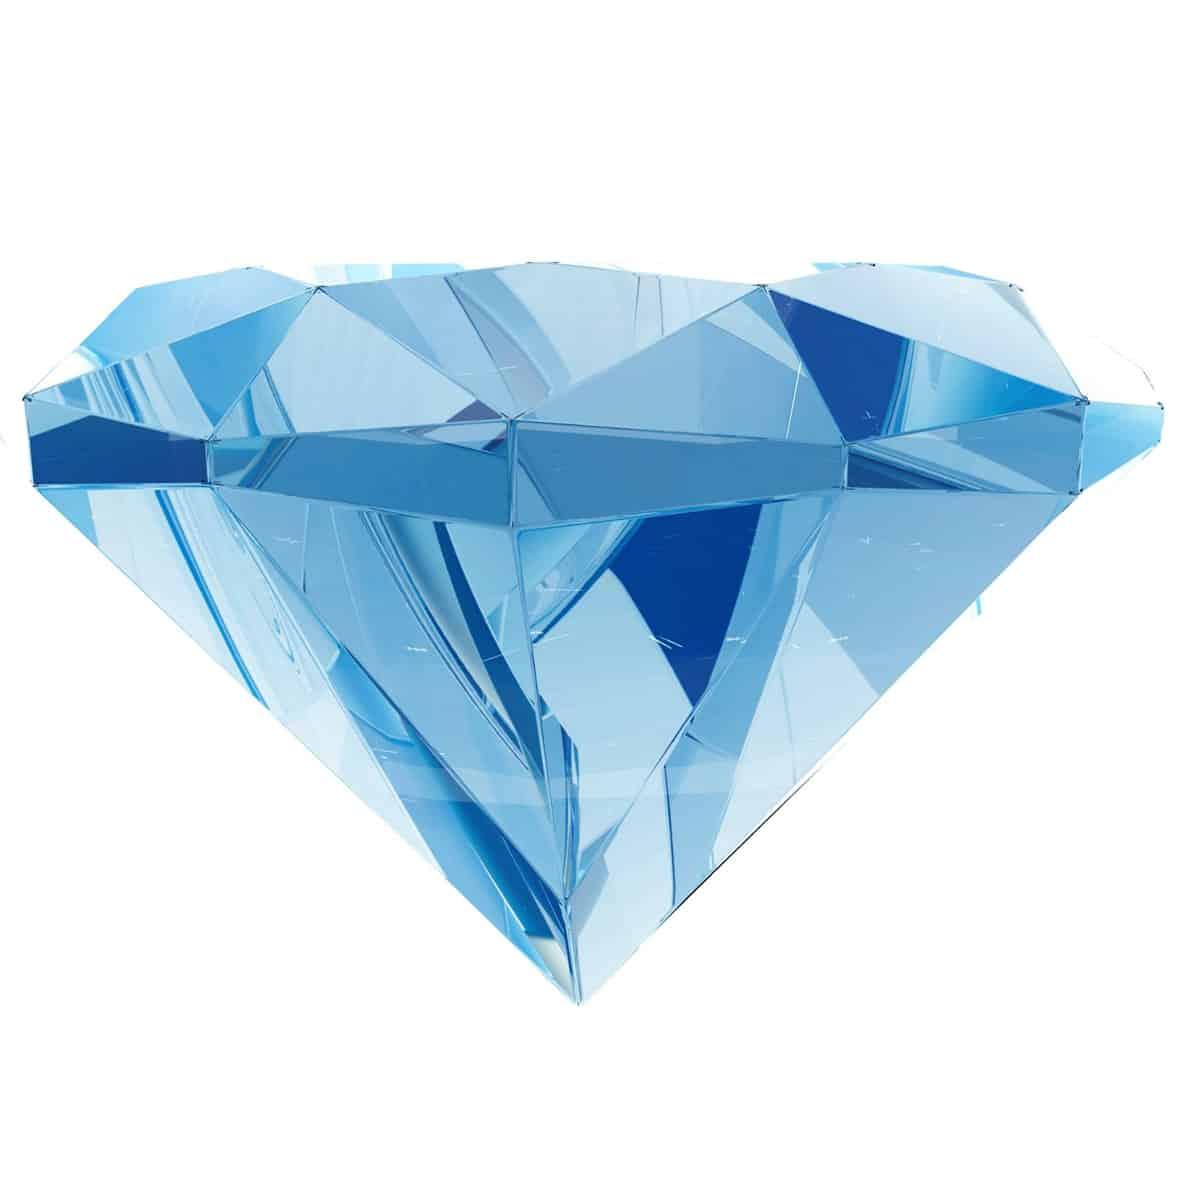 https://danielakreissig.de/wp-content/uploads/2021/04/Diamant_10_10.jpg